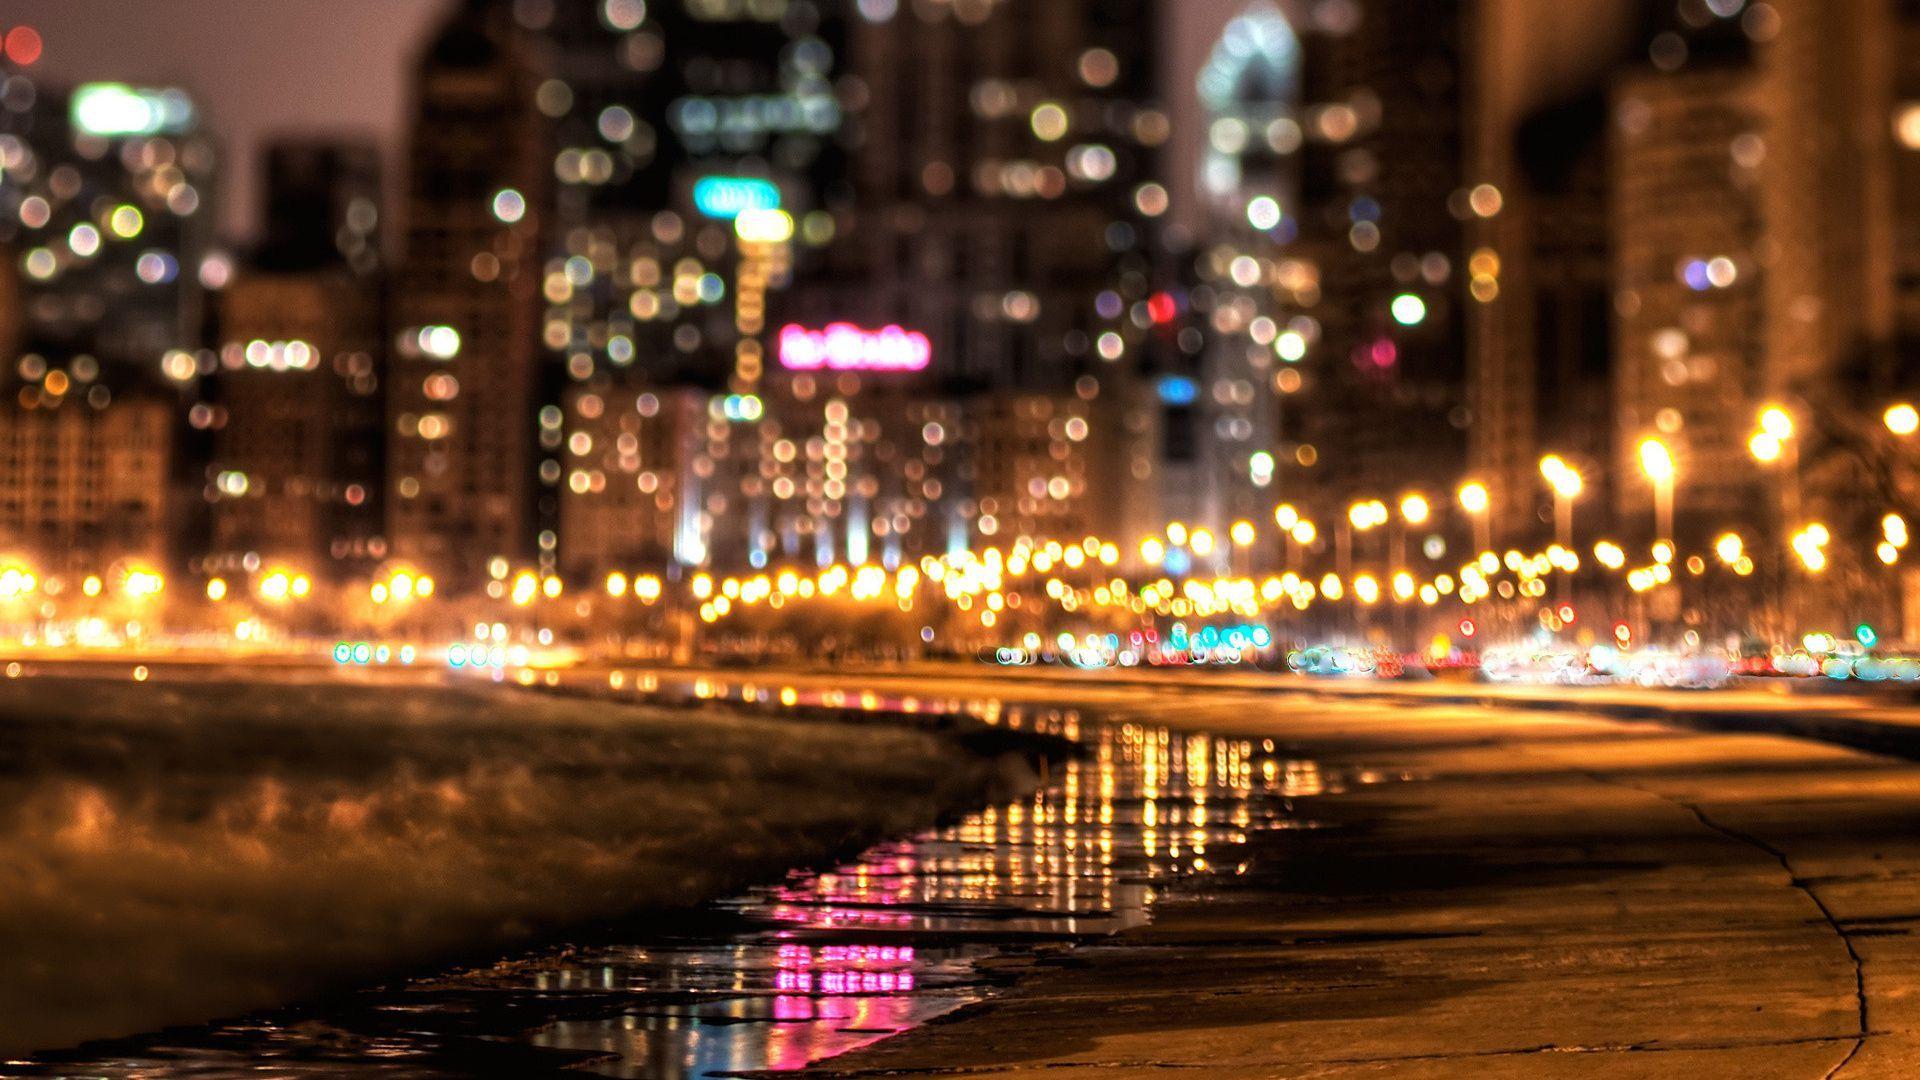 Night City Landscape 180391 Bokeh Photography Landscape Wallpaper City Lights